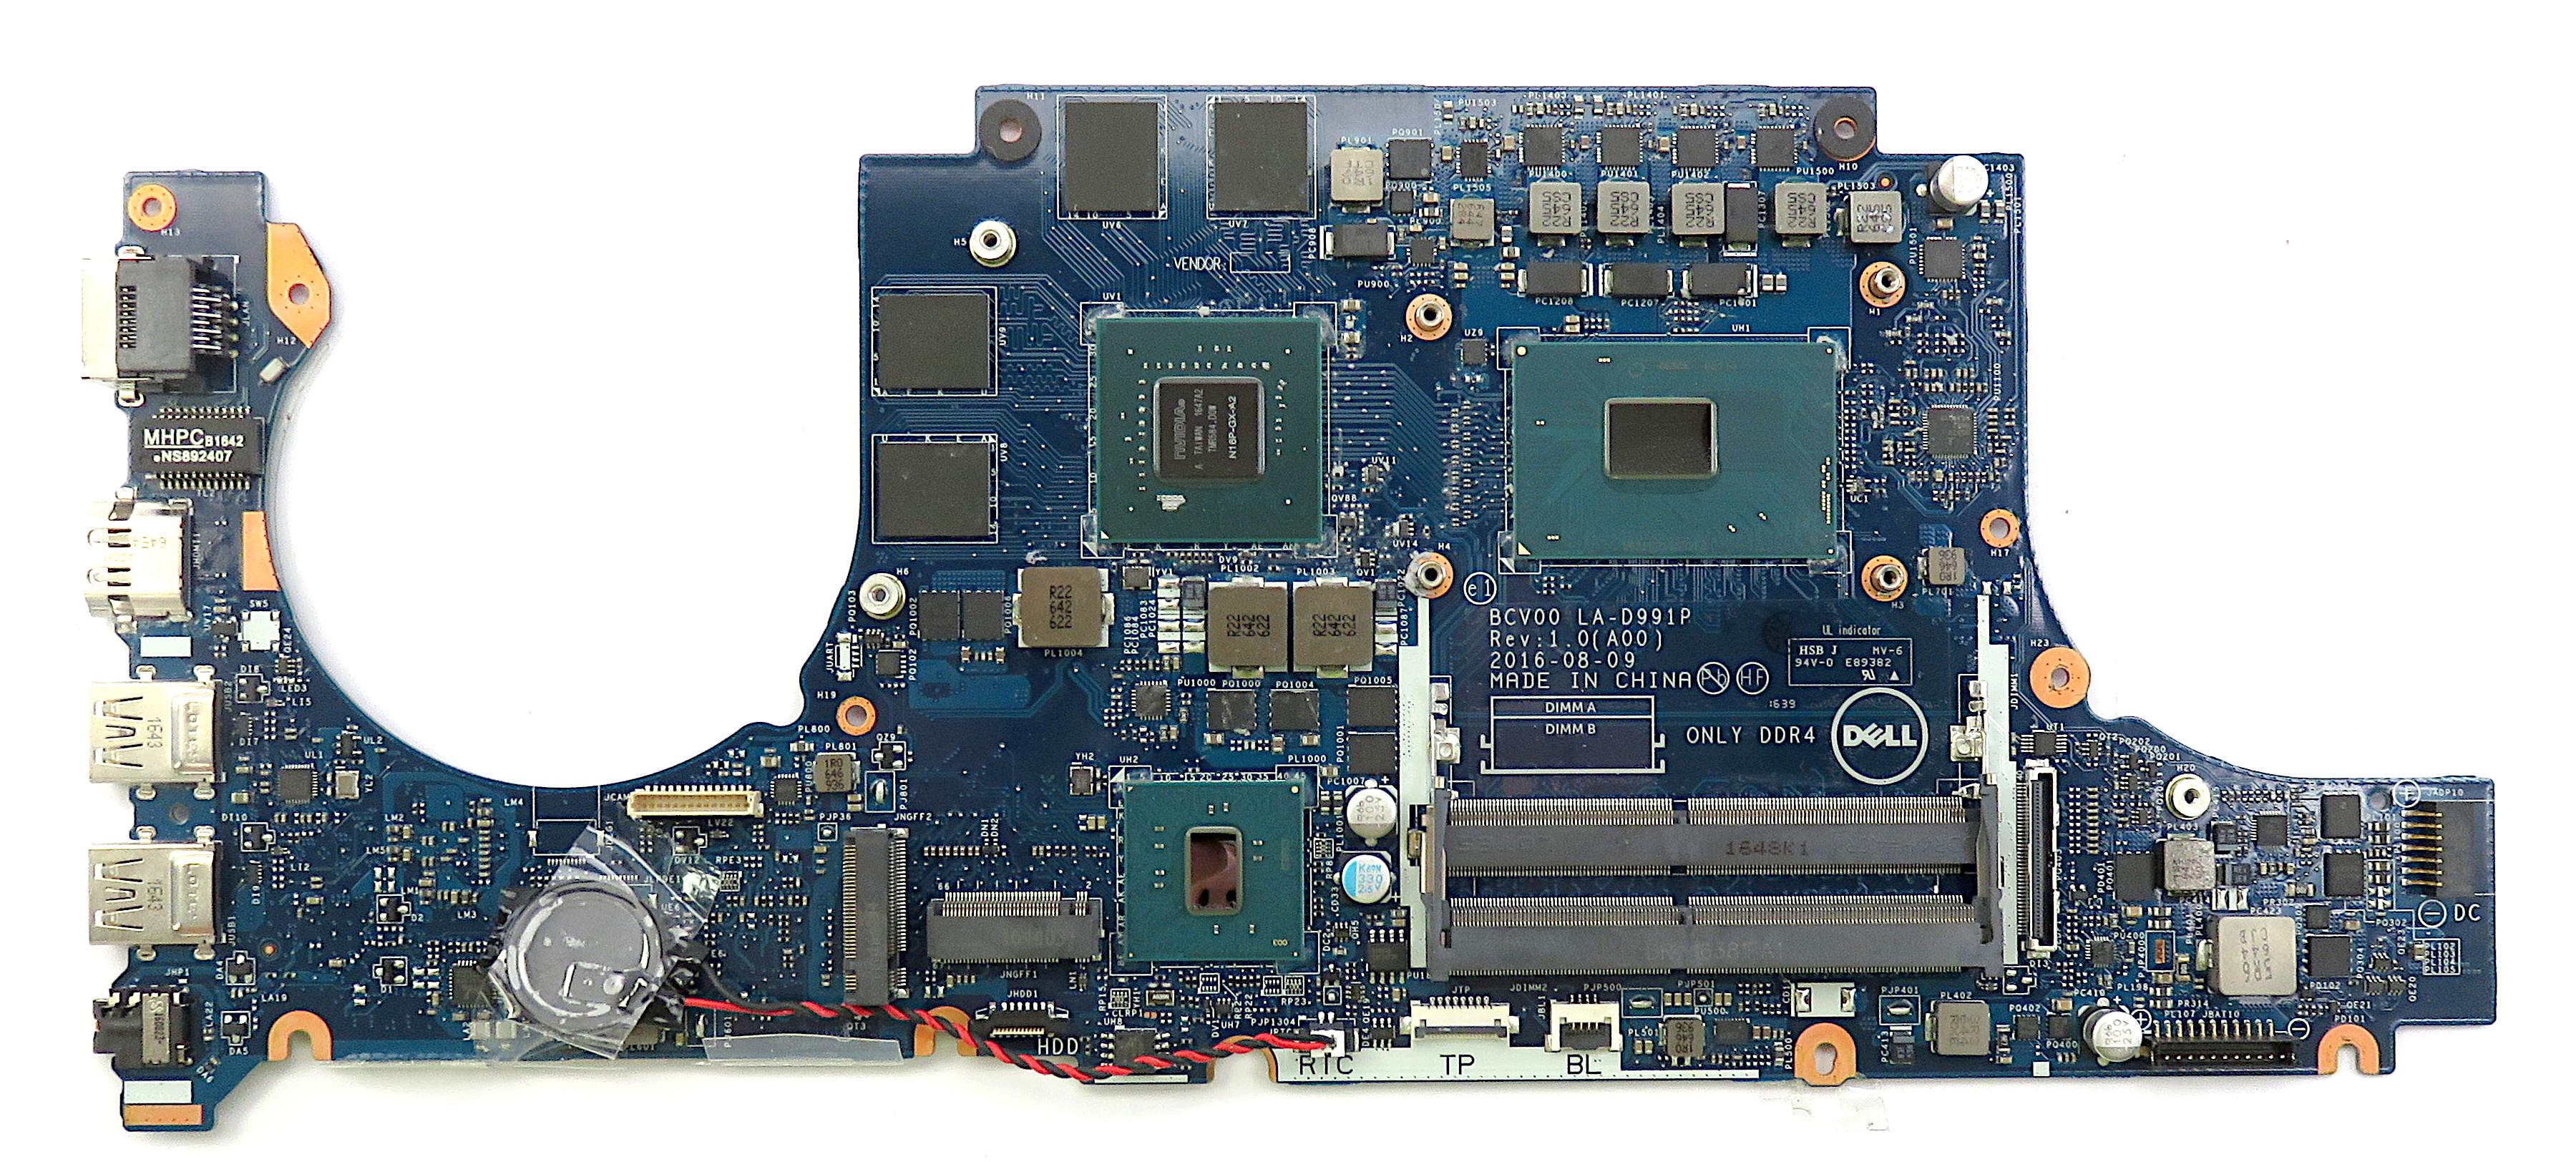 Dell 077V33 Motherboard f/ Inspiron 15 Gaming 7566 w/ i7-6700HQ & GTX 960M 4GB